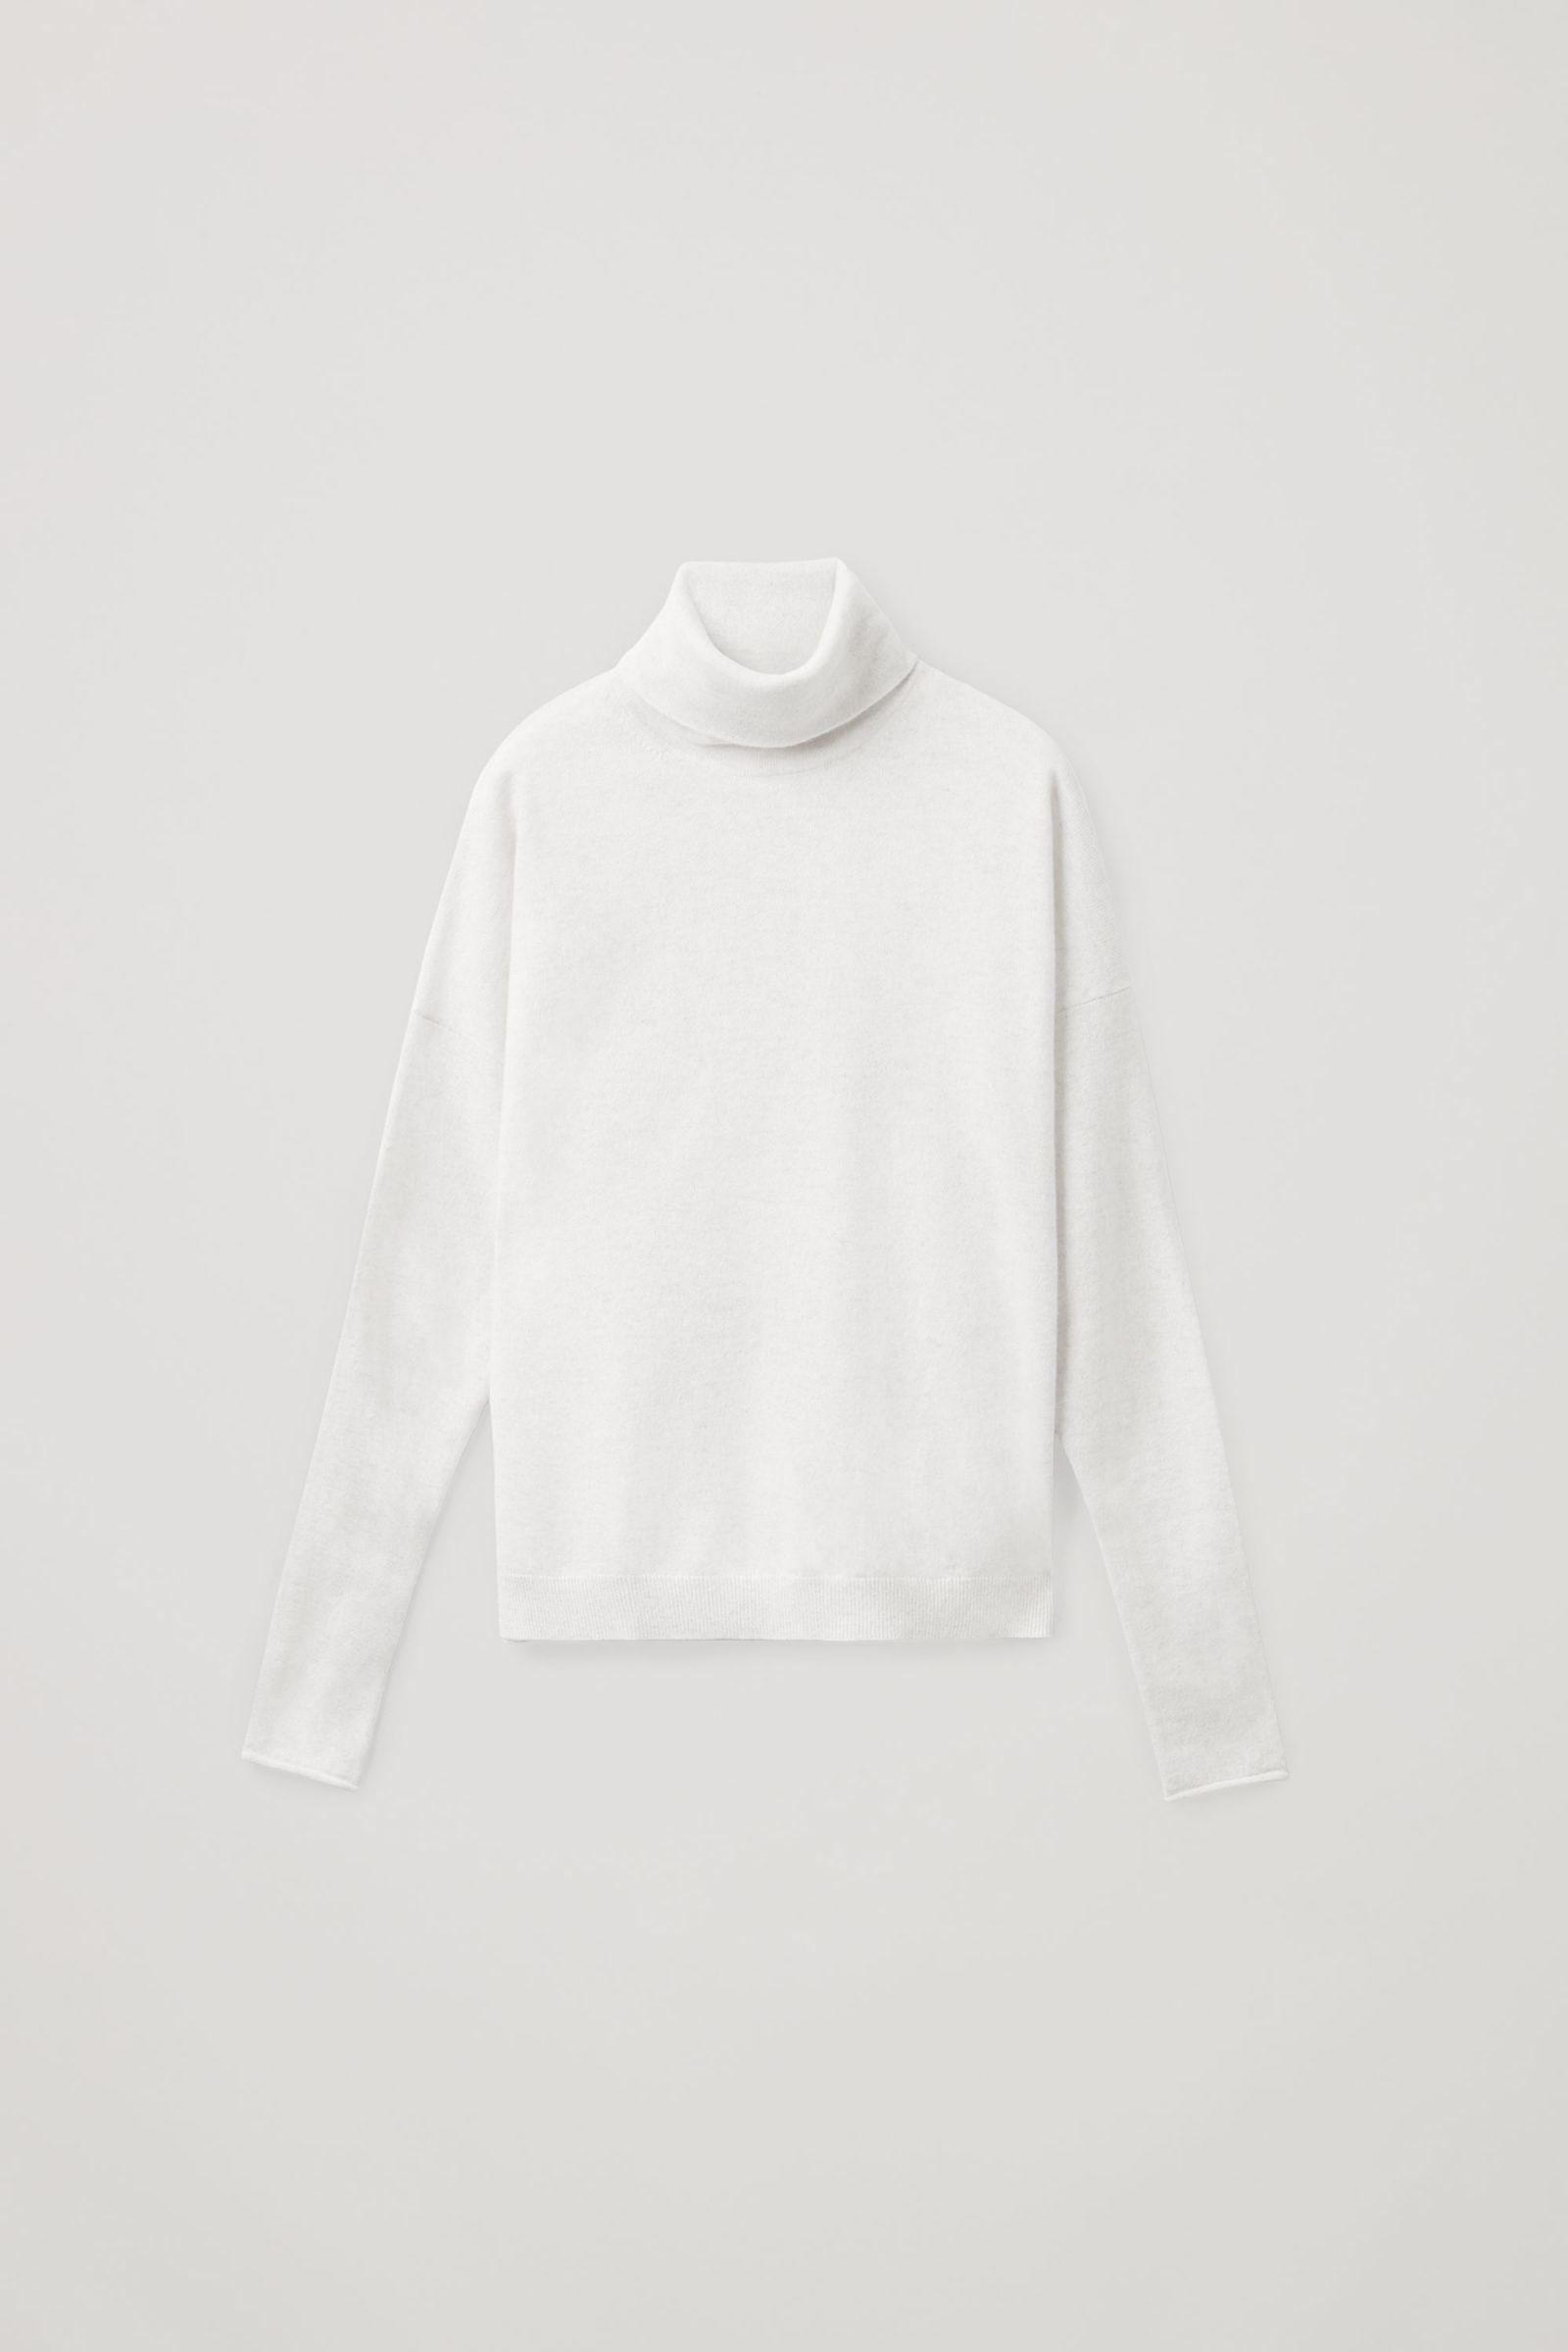 COS 롤넥 캐시미어 스웨터의 라이트 그레이컬러 Product입니다.